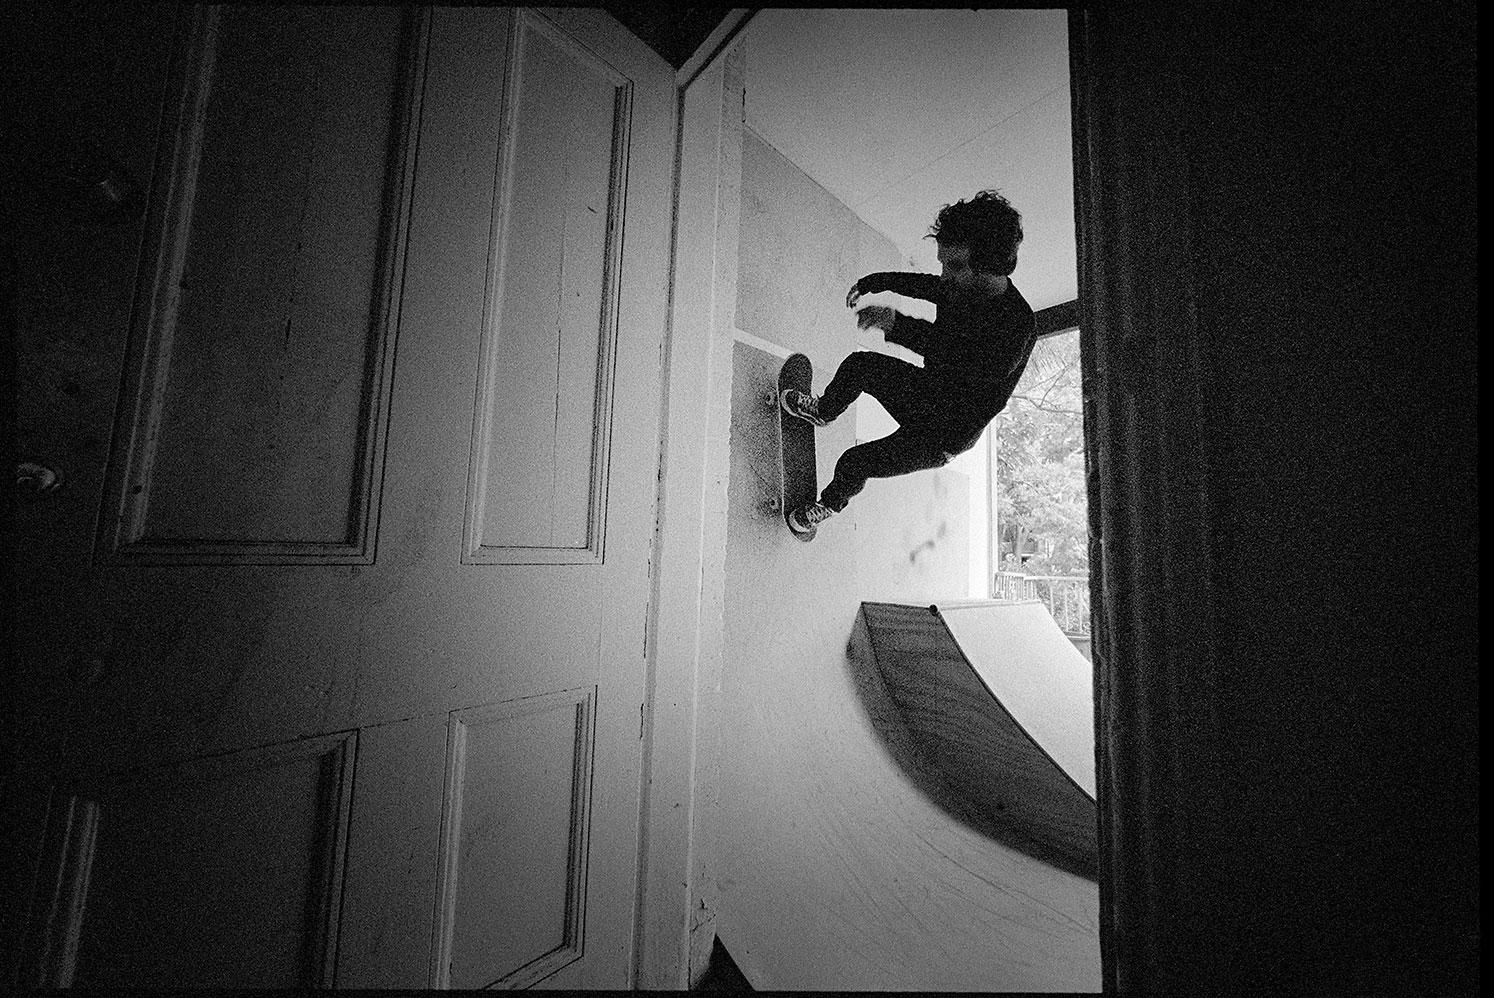 Joel, Wallride in doorway, Death Trap Ramp, Enmore, NSW, Silver Gelatin Print, 50.8cm x 60.1cm, 1/5